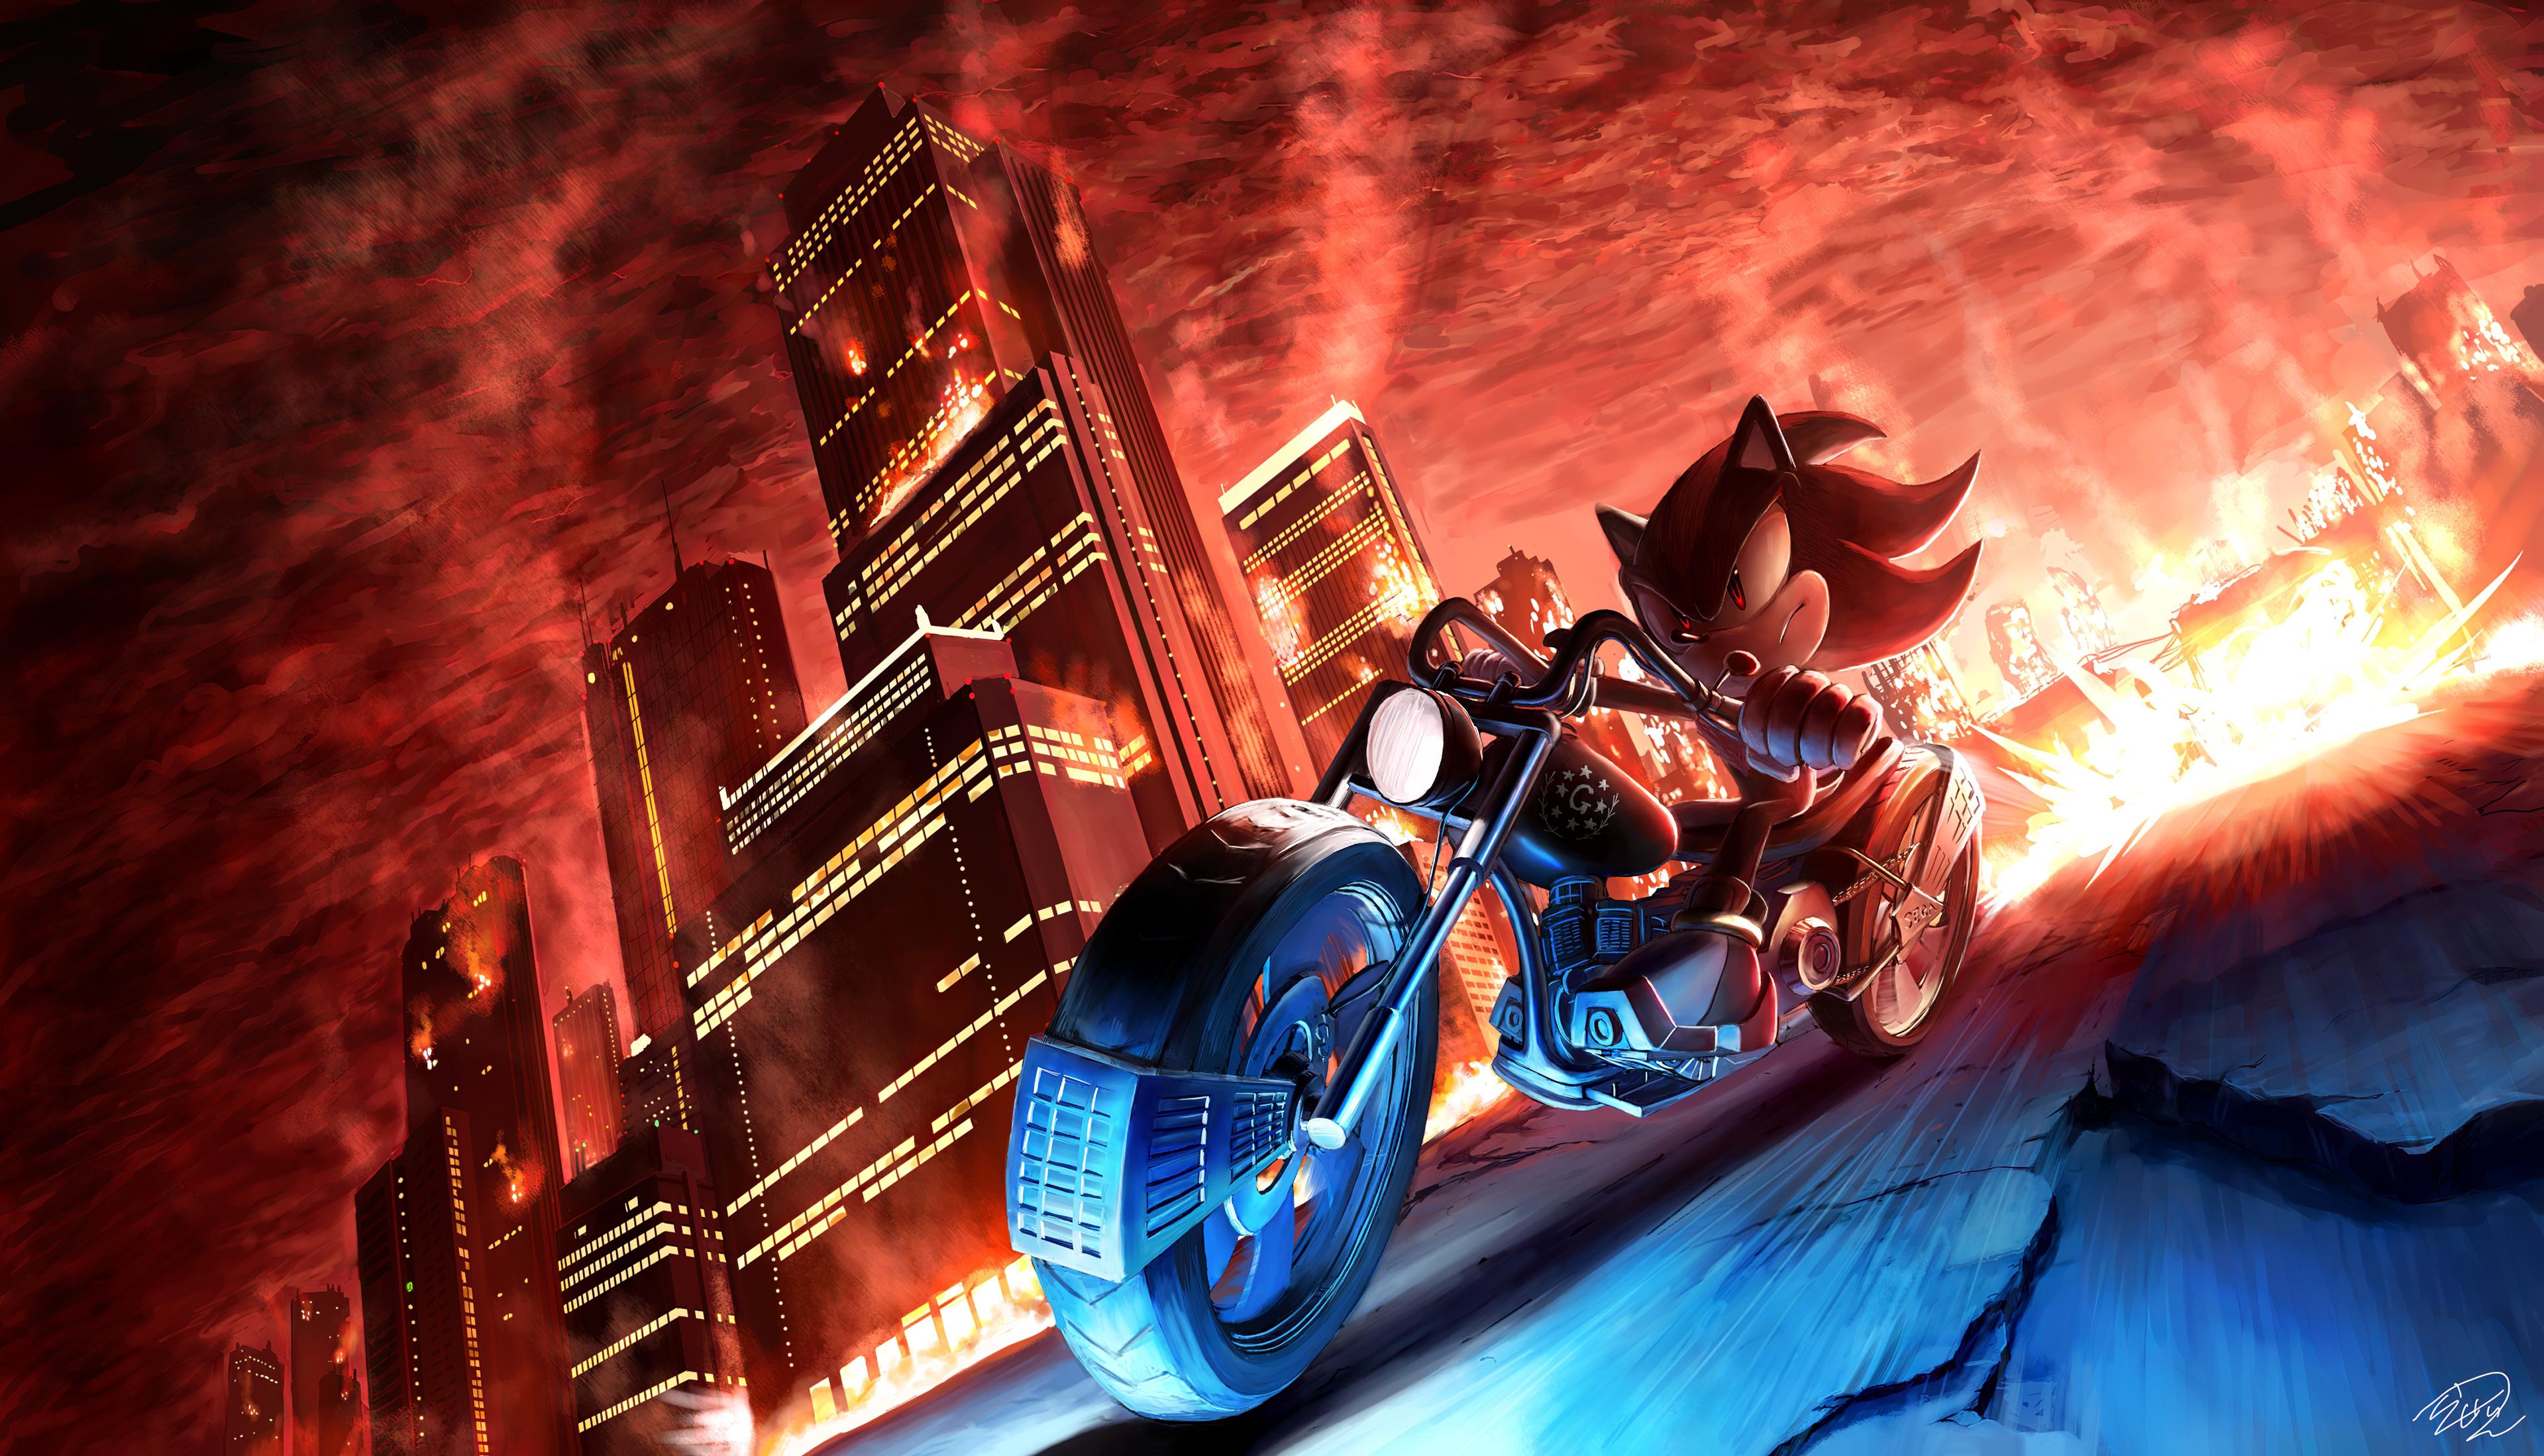 Sonic Shadow The Hedgehog 4k Hd Movies 4k Wallpapers